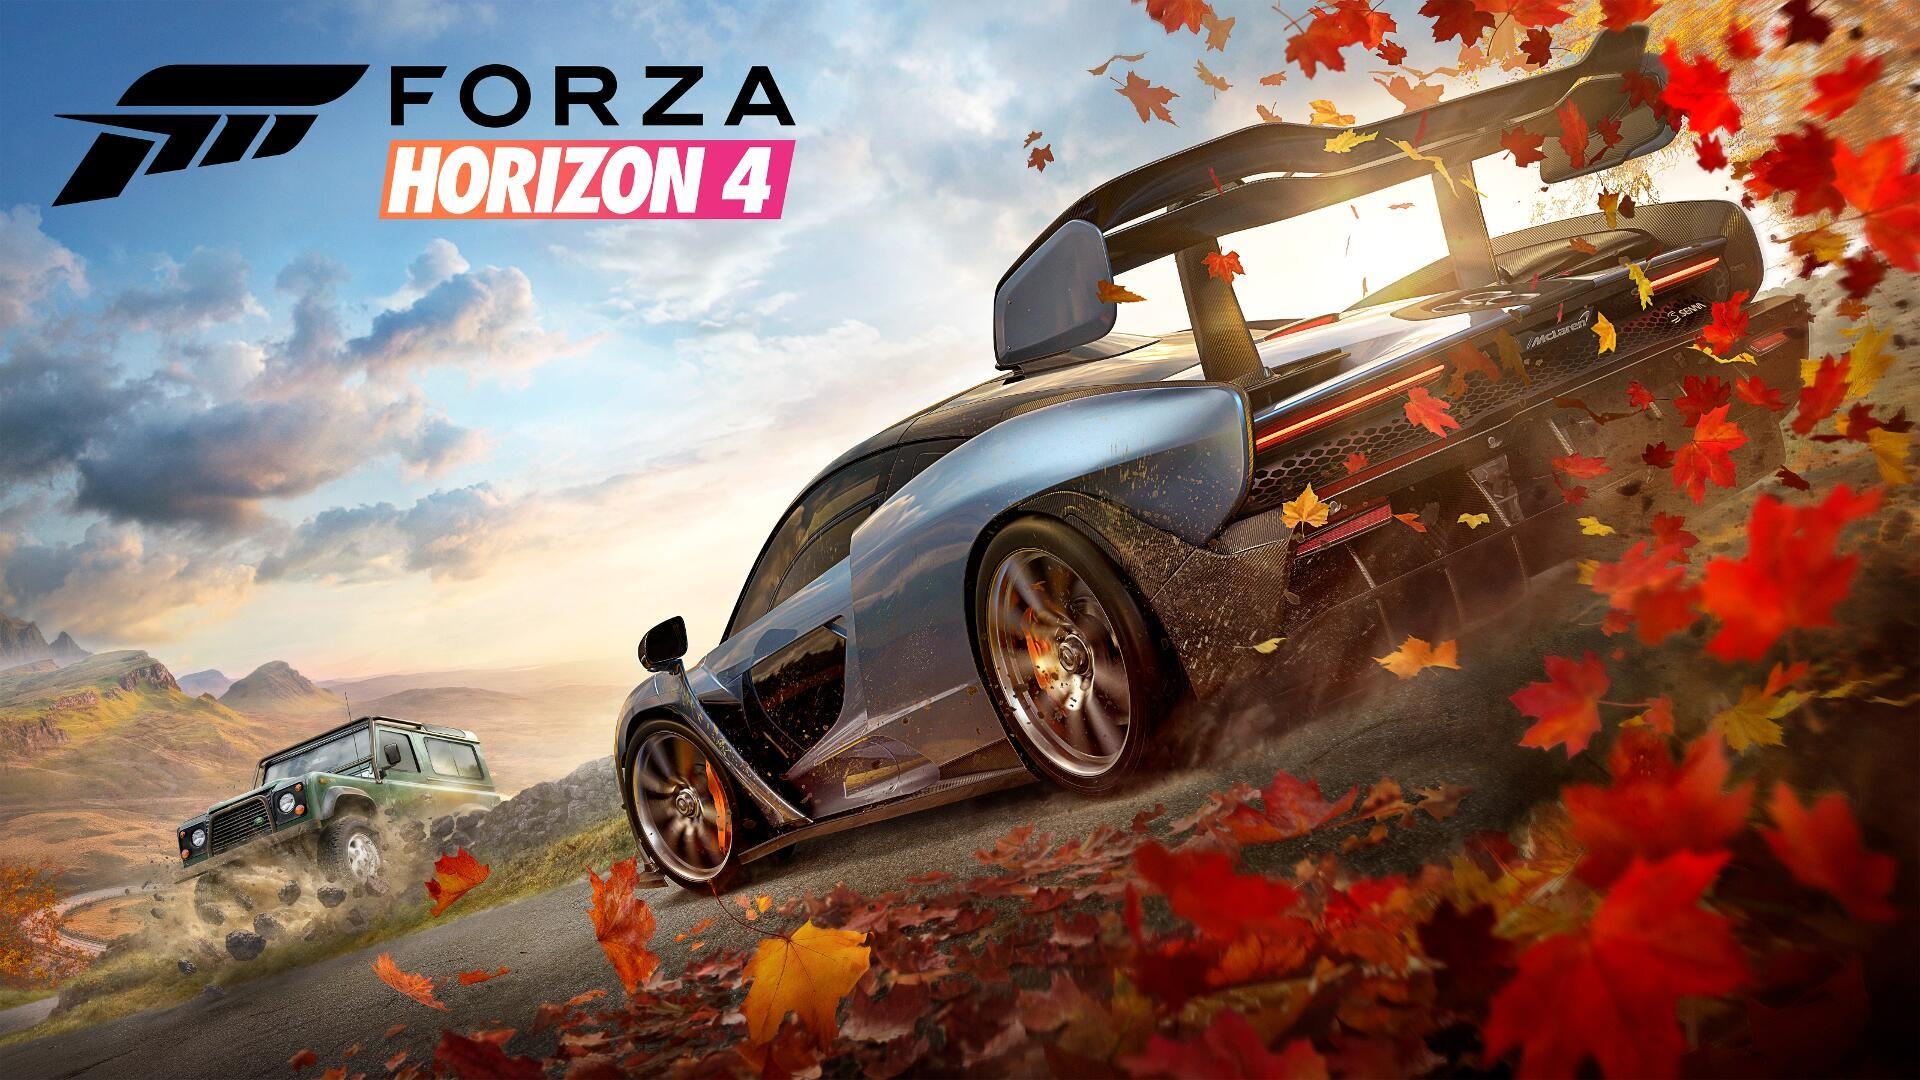 Download Forza Horizon 4: Ultimate Edition v1 332 904 2 +